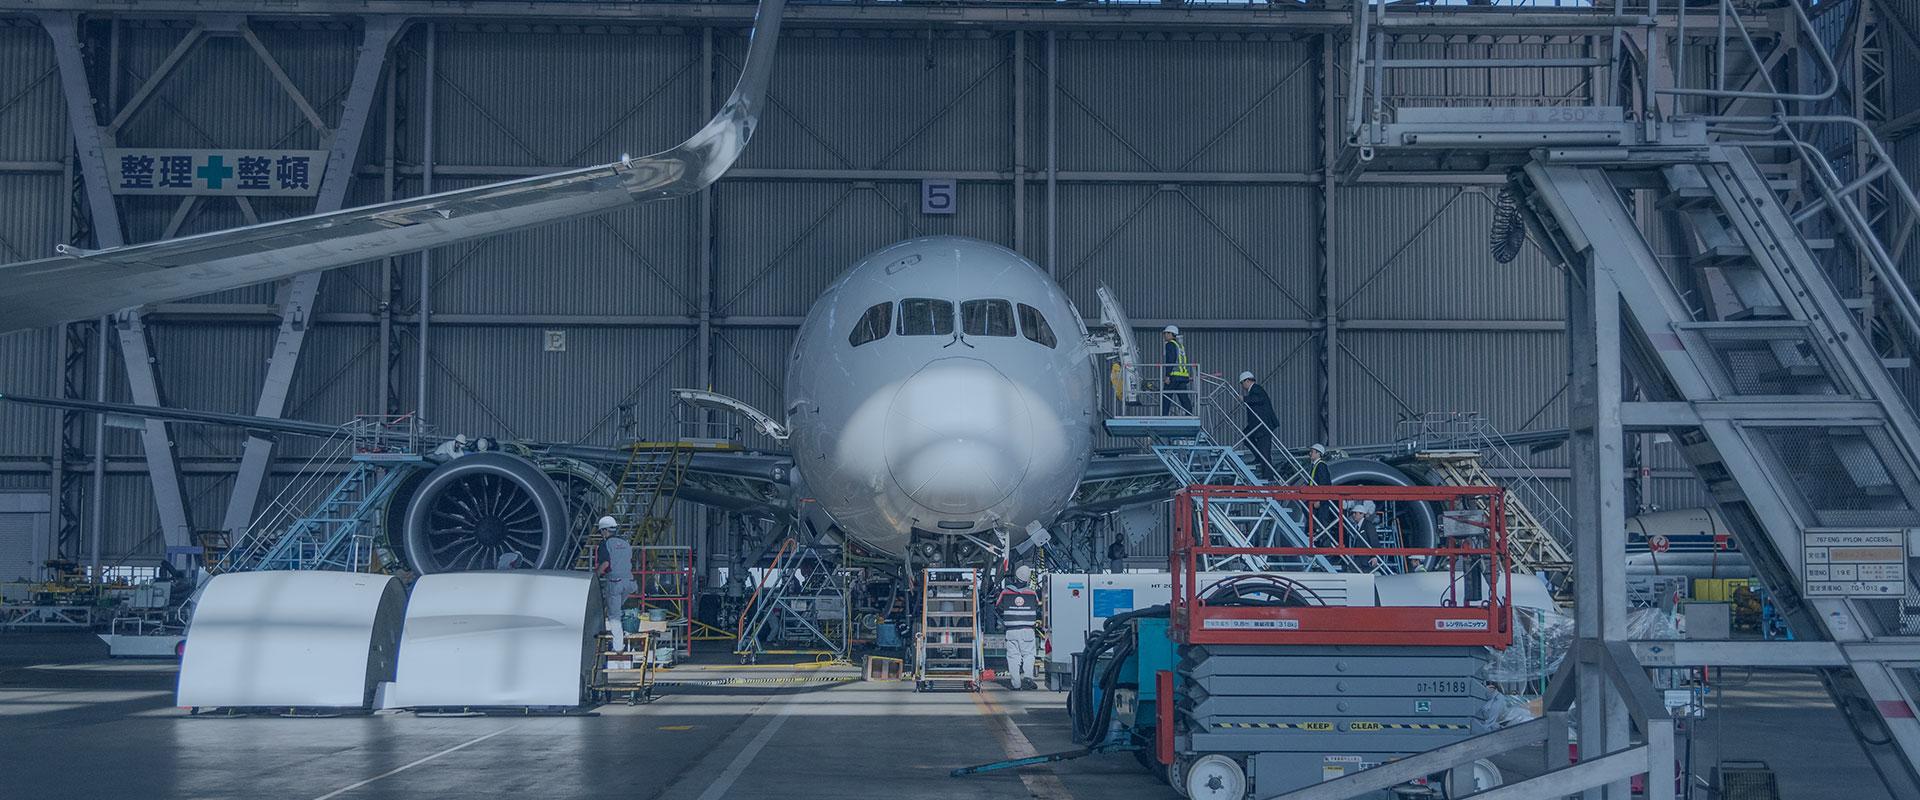 Capa banner-01.jpg - Seguro de Resp. Civil Hangares